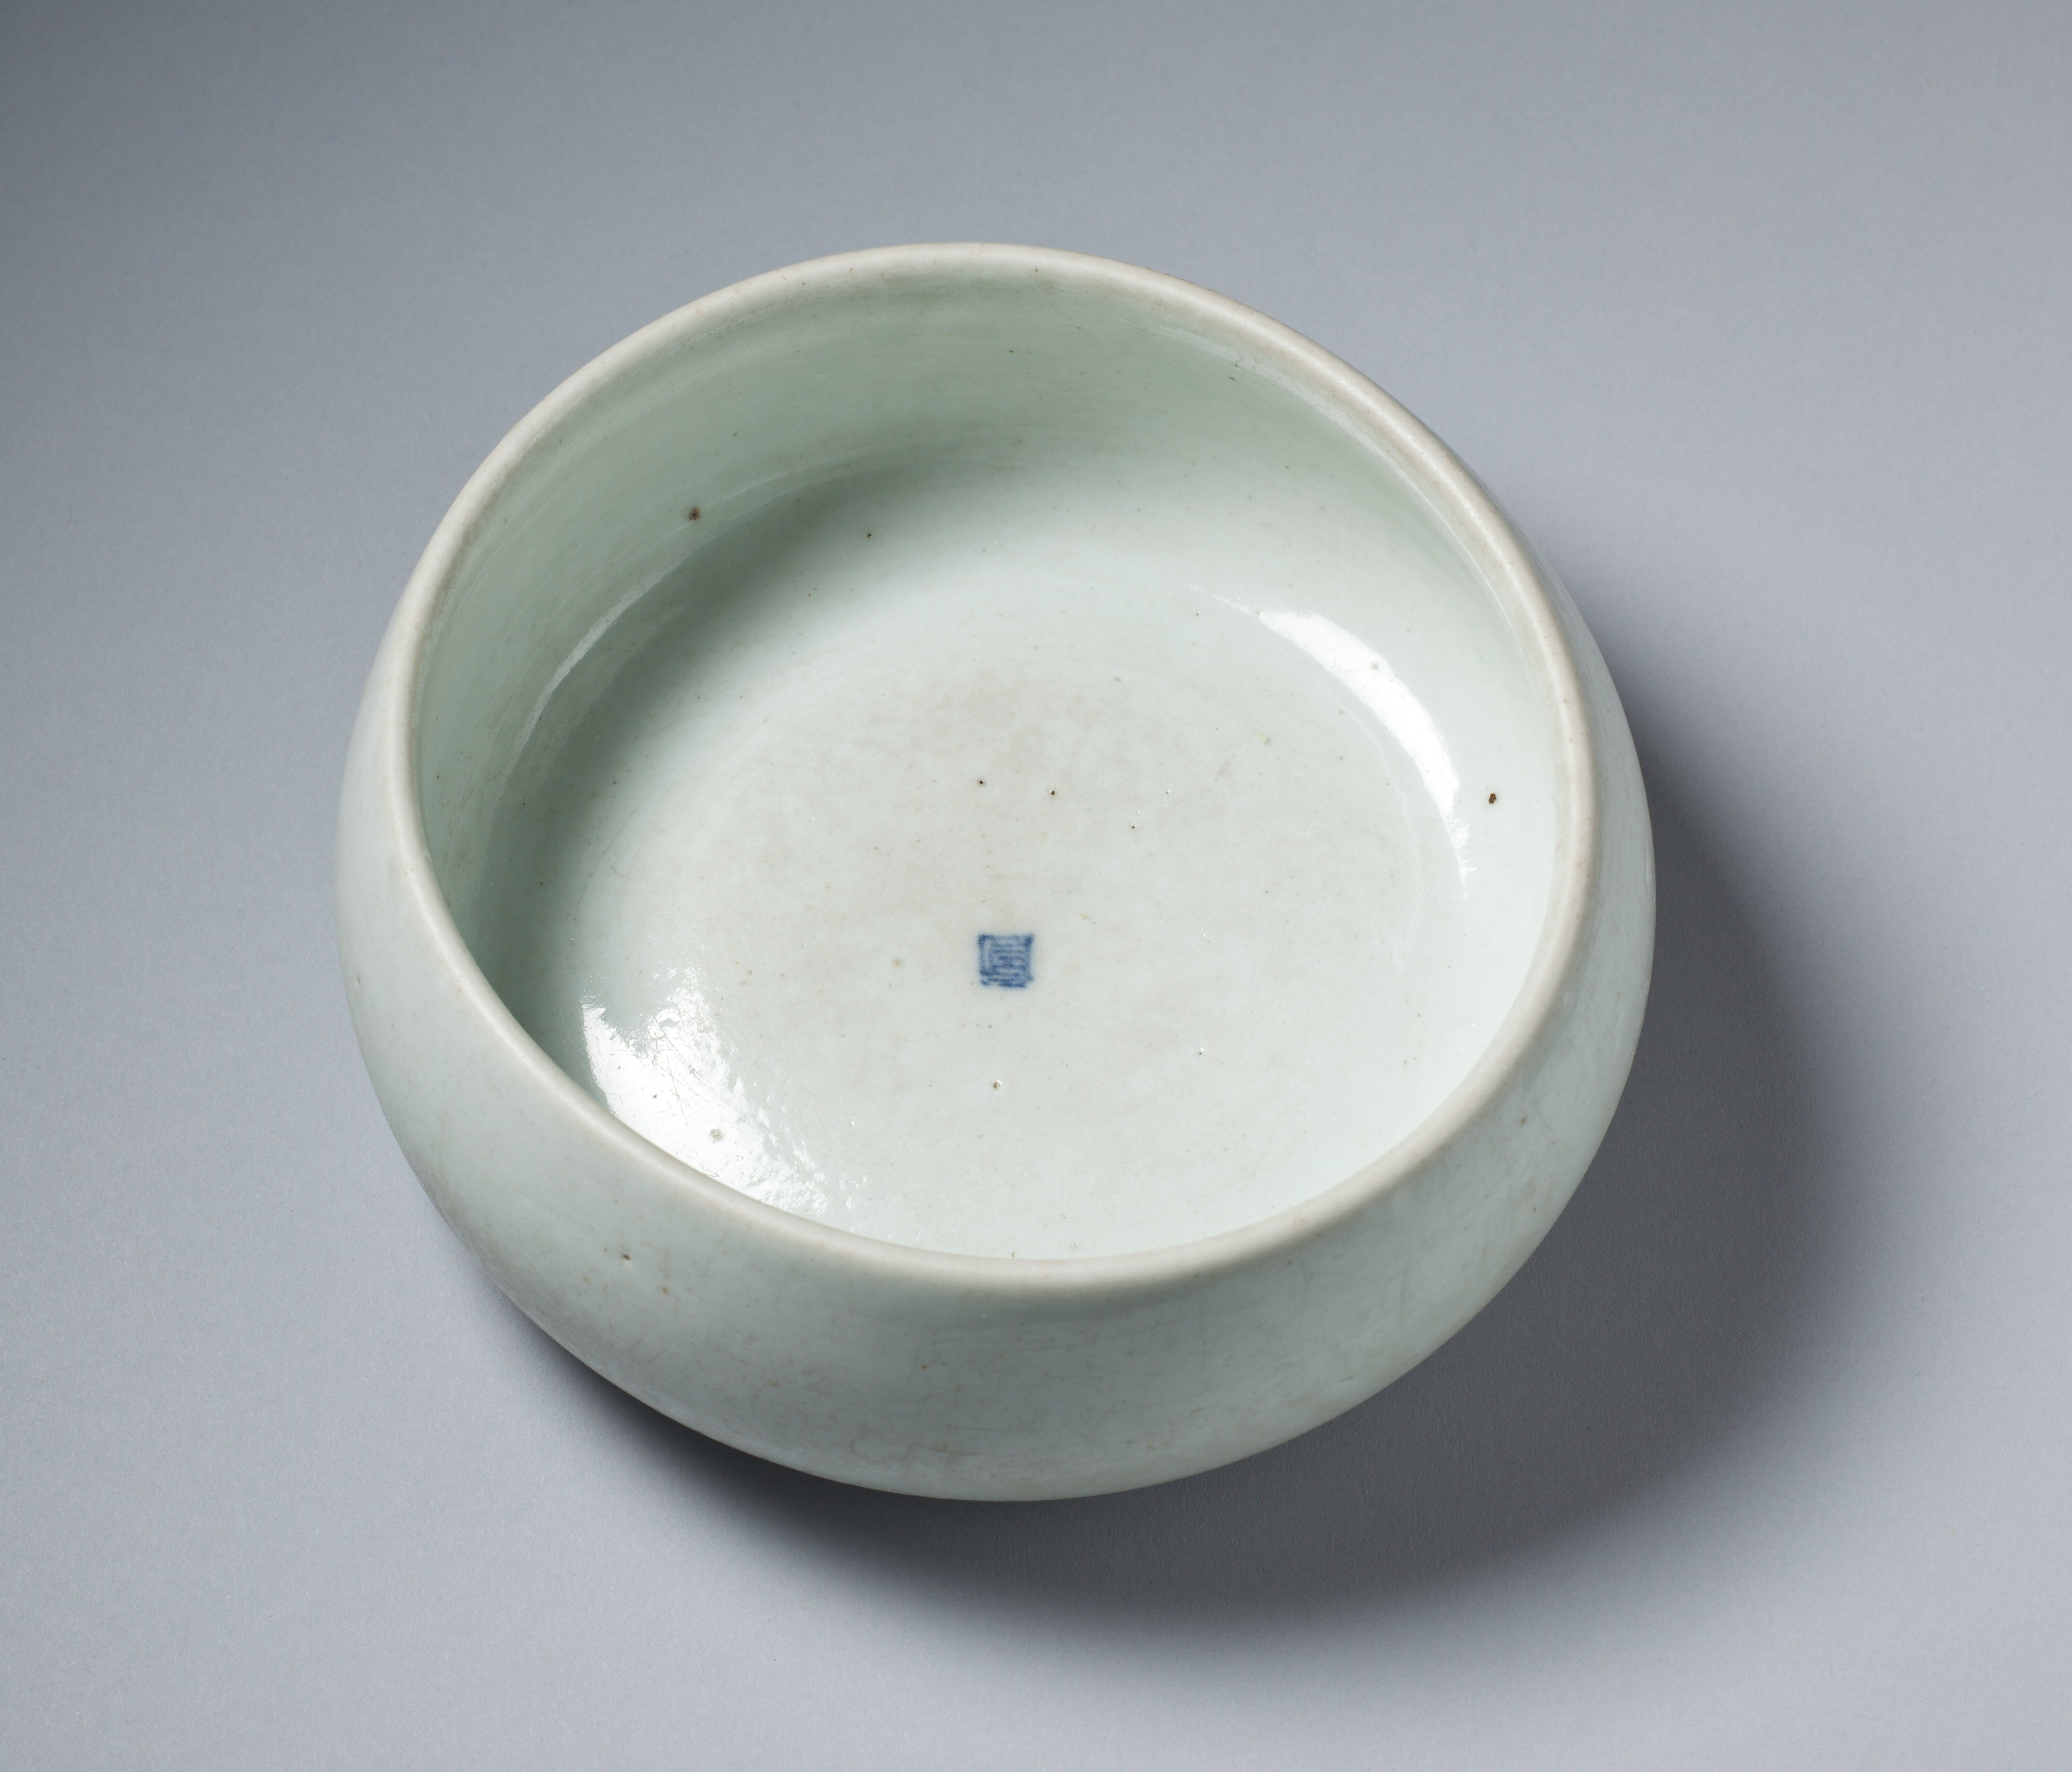 Bowl With Chinese Character For Longevity Korea Mia